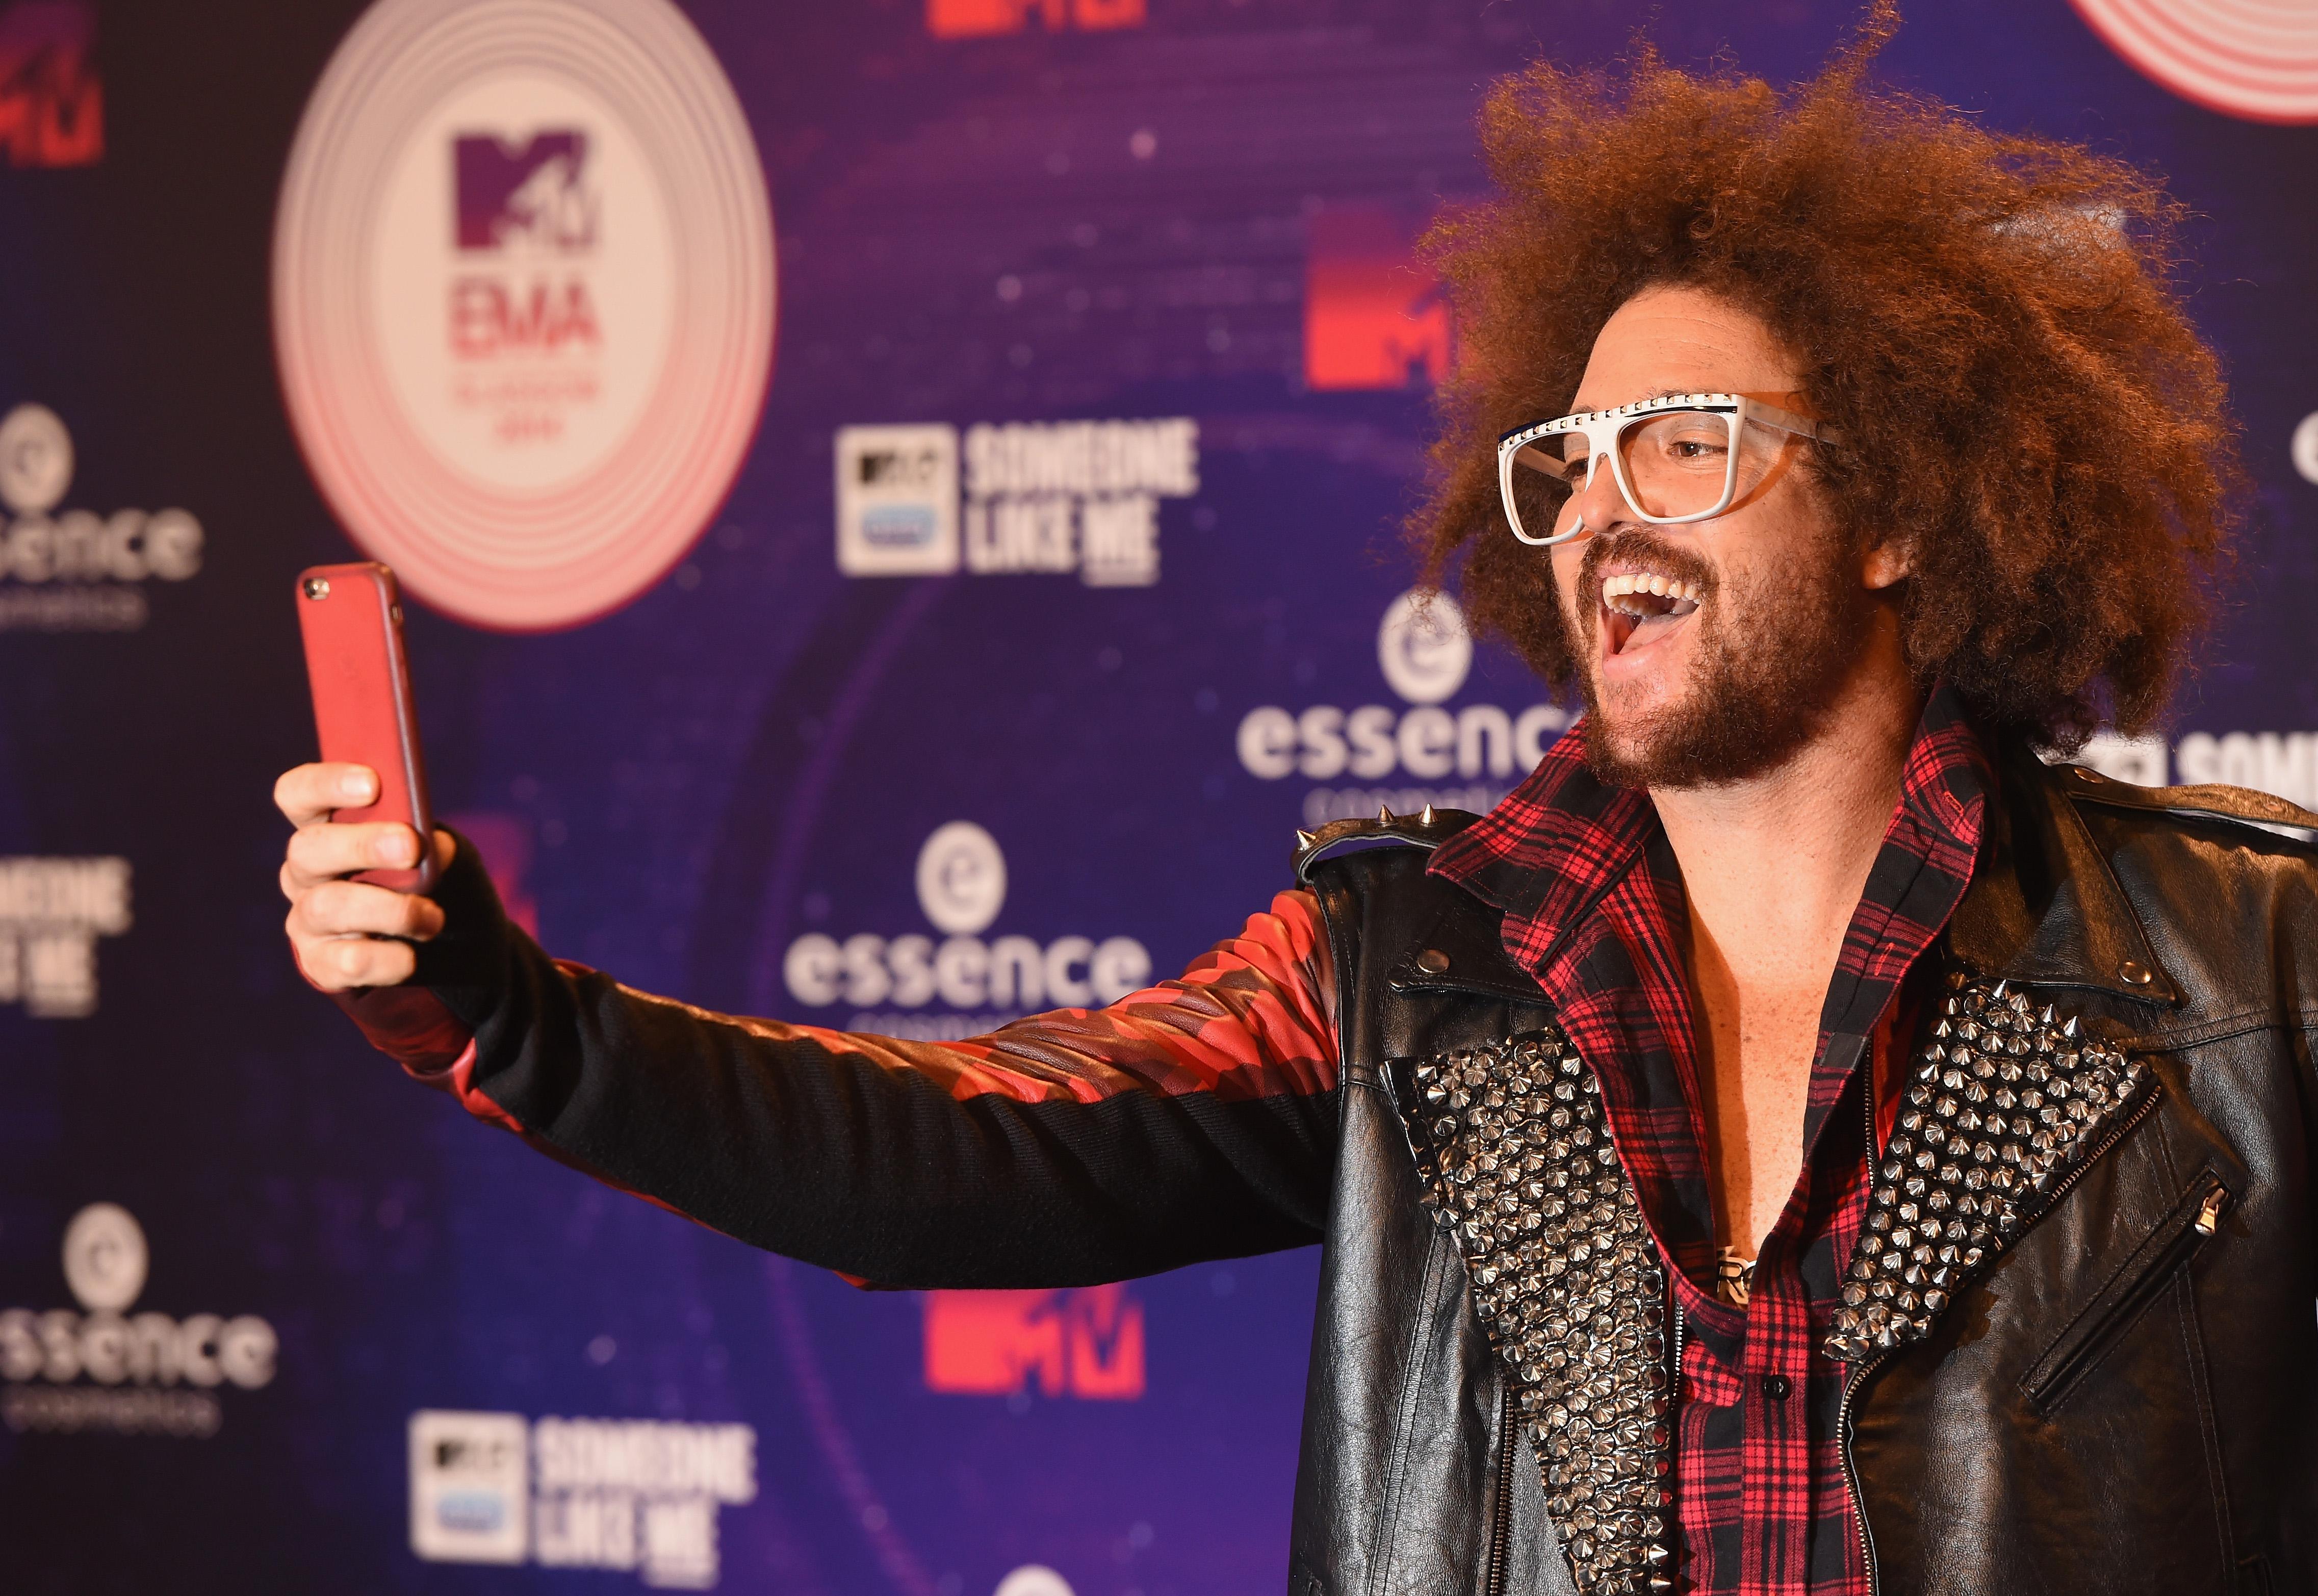 GLASGOW, SCOTLAND - NOVEMBER 09:  Redfoo attends the MTV EMA's 2014 at The Hydro on November 9, 2014 in Glasgow, Scotland.  (